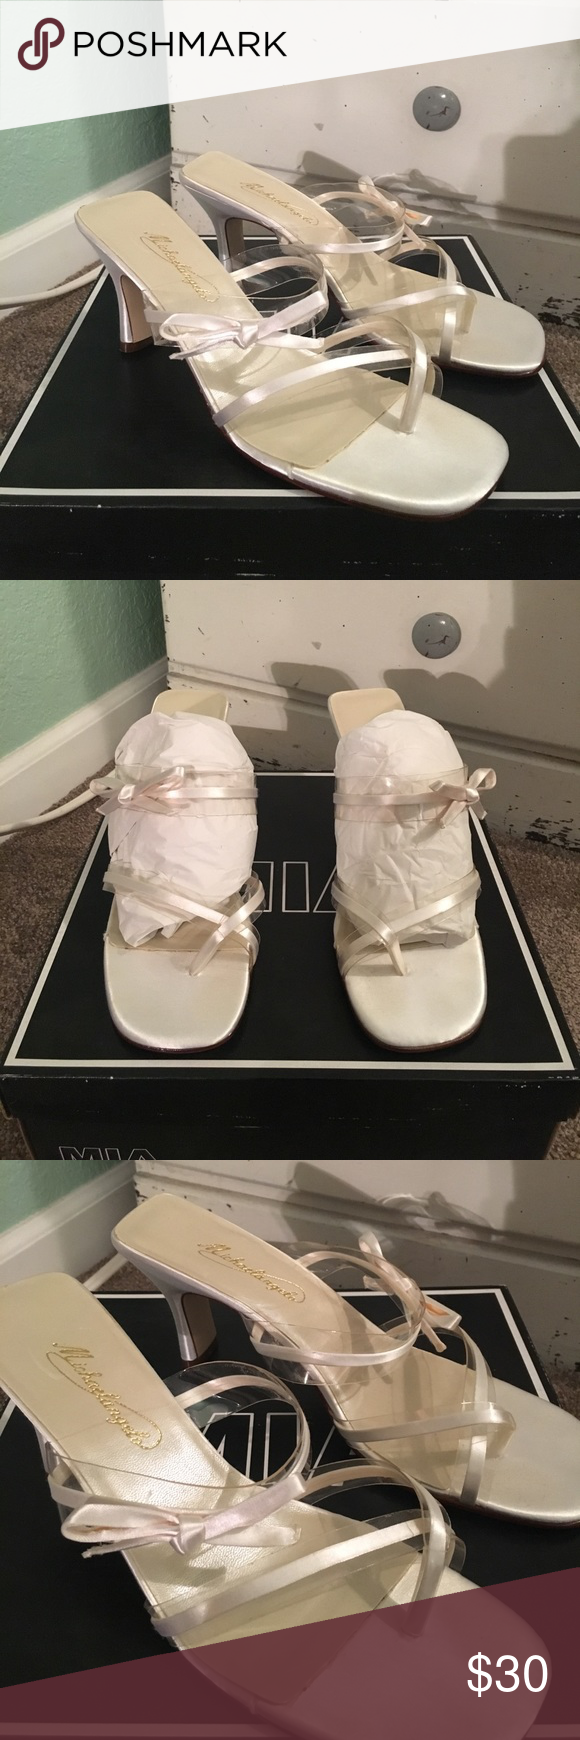 Michaelangelo wedding dress  Shelby Classic wedding heel by Michaelangelo From Davidus Bridal